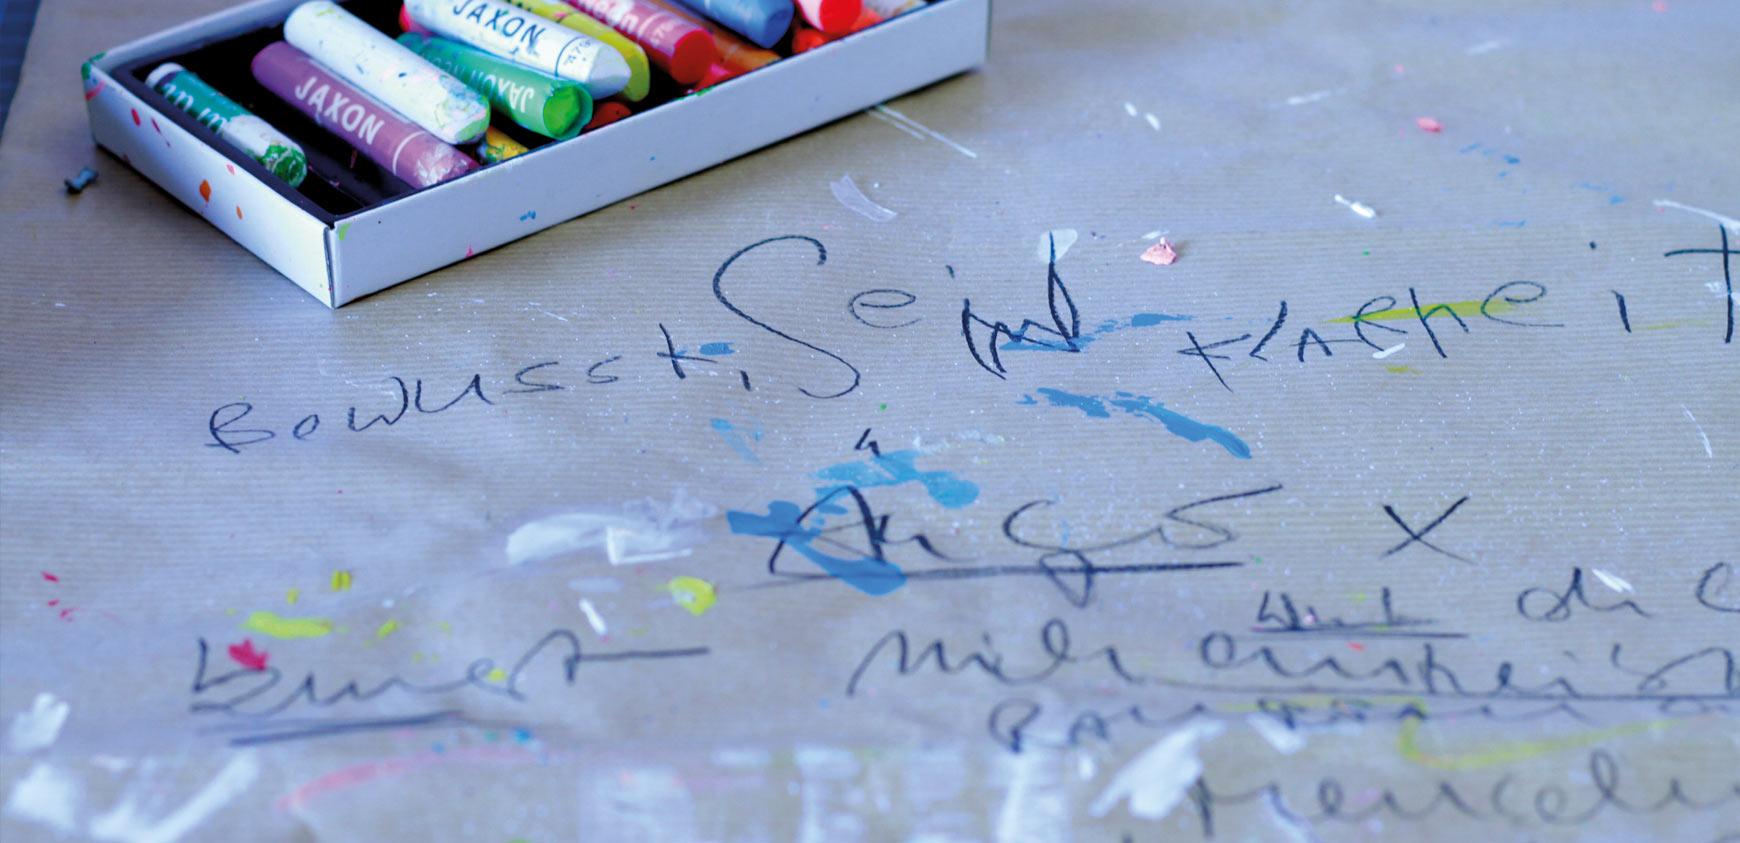 Hohenwarters eigene Handschrift